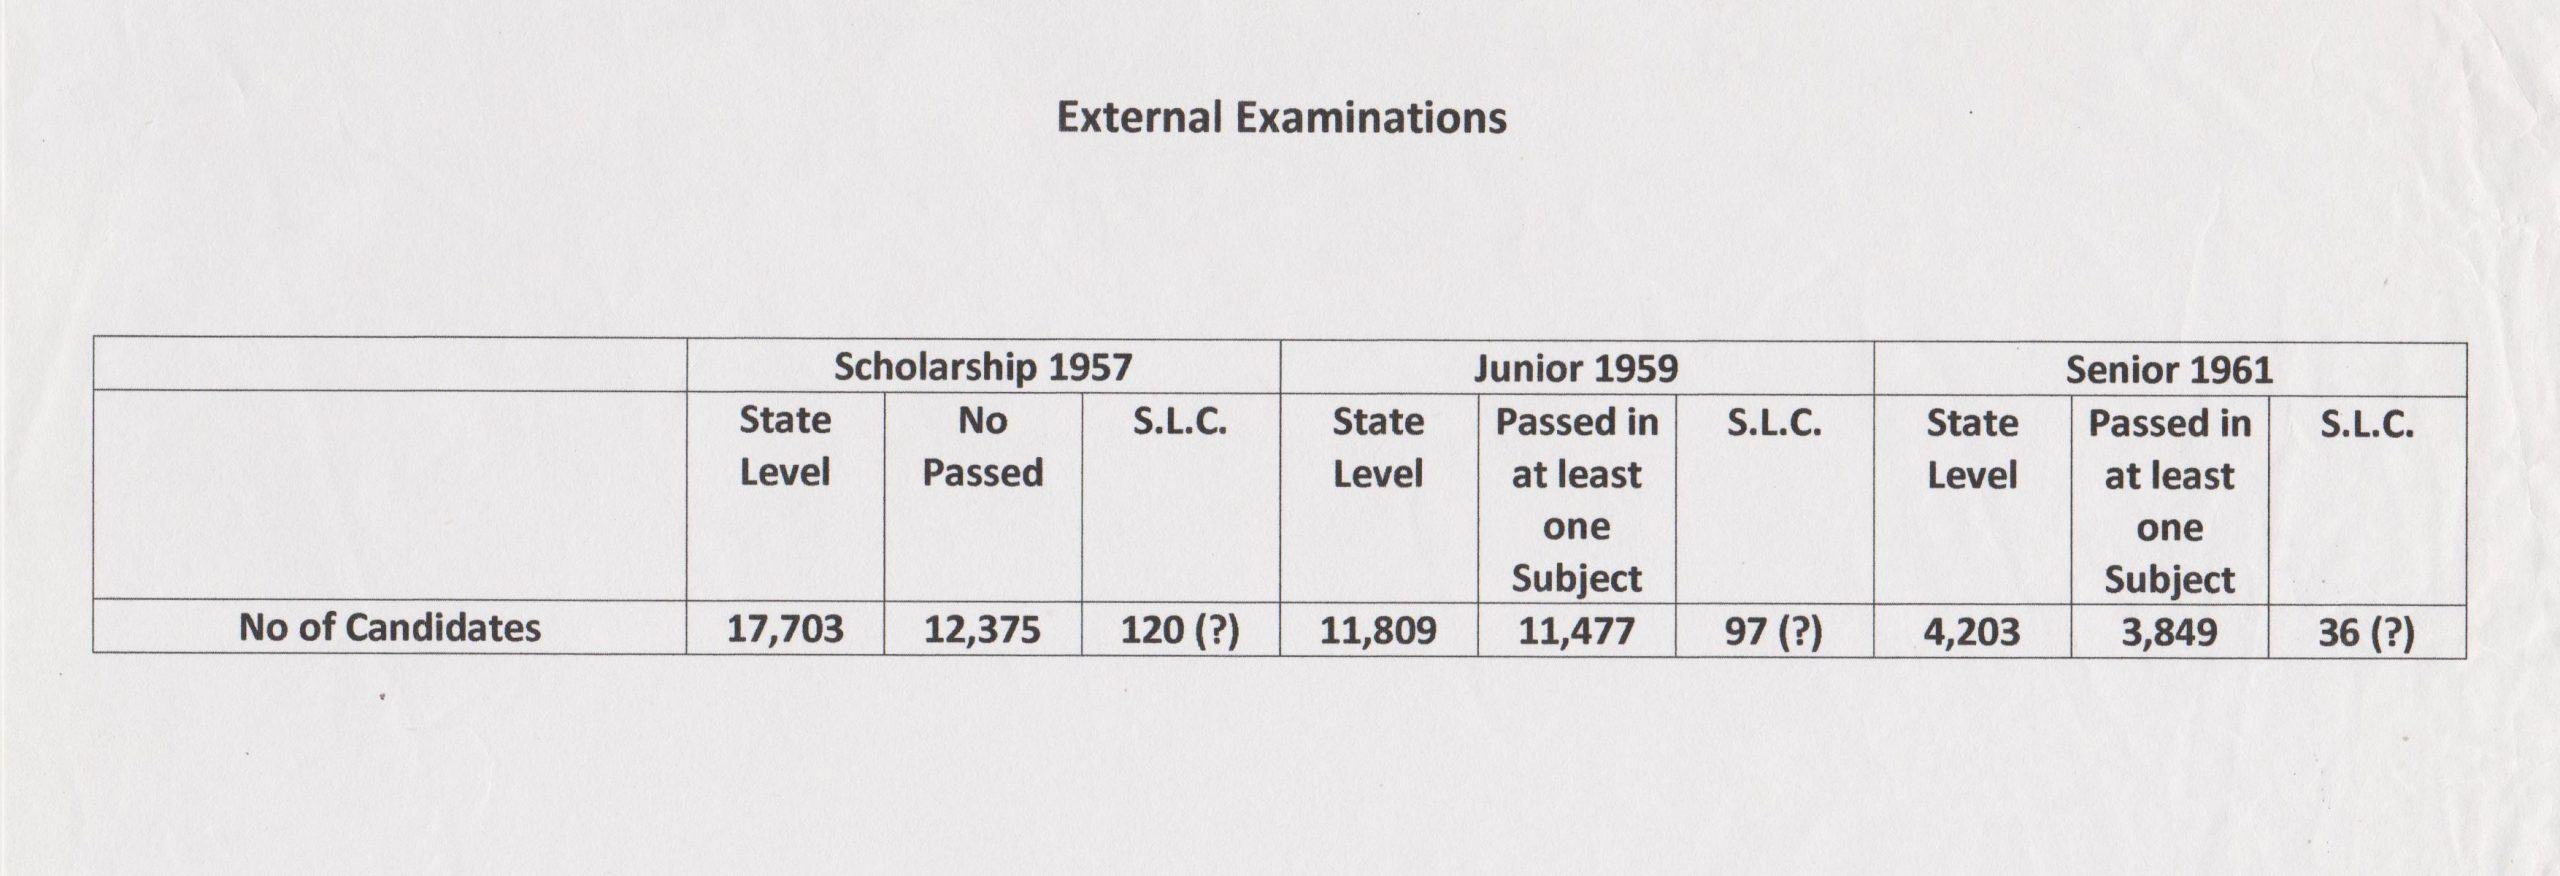 1 External Examinations